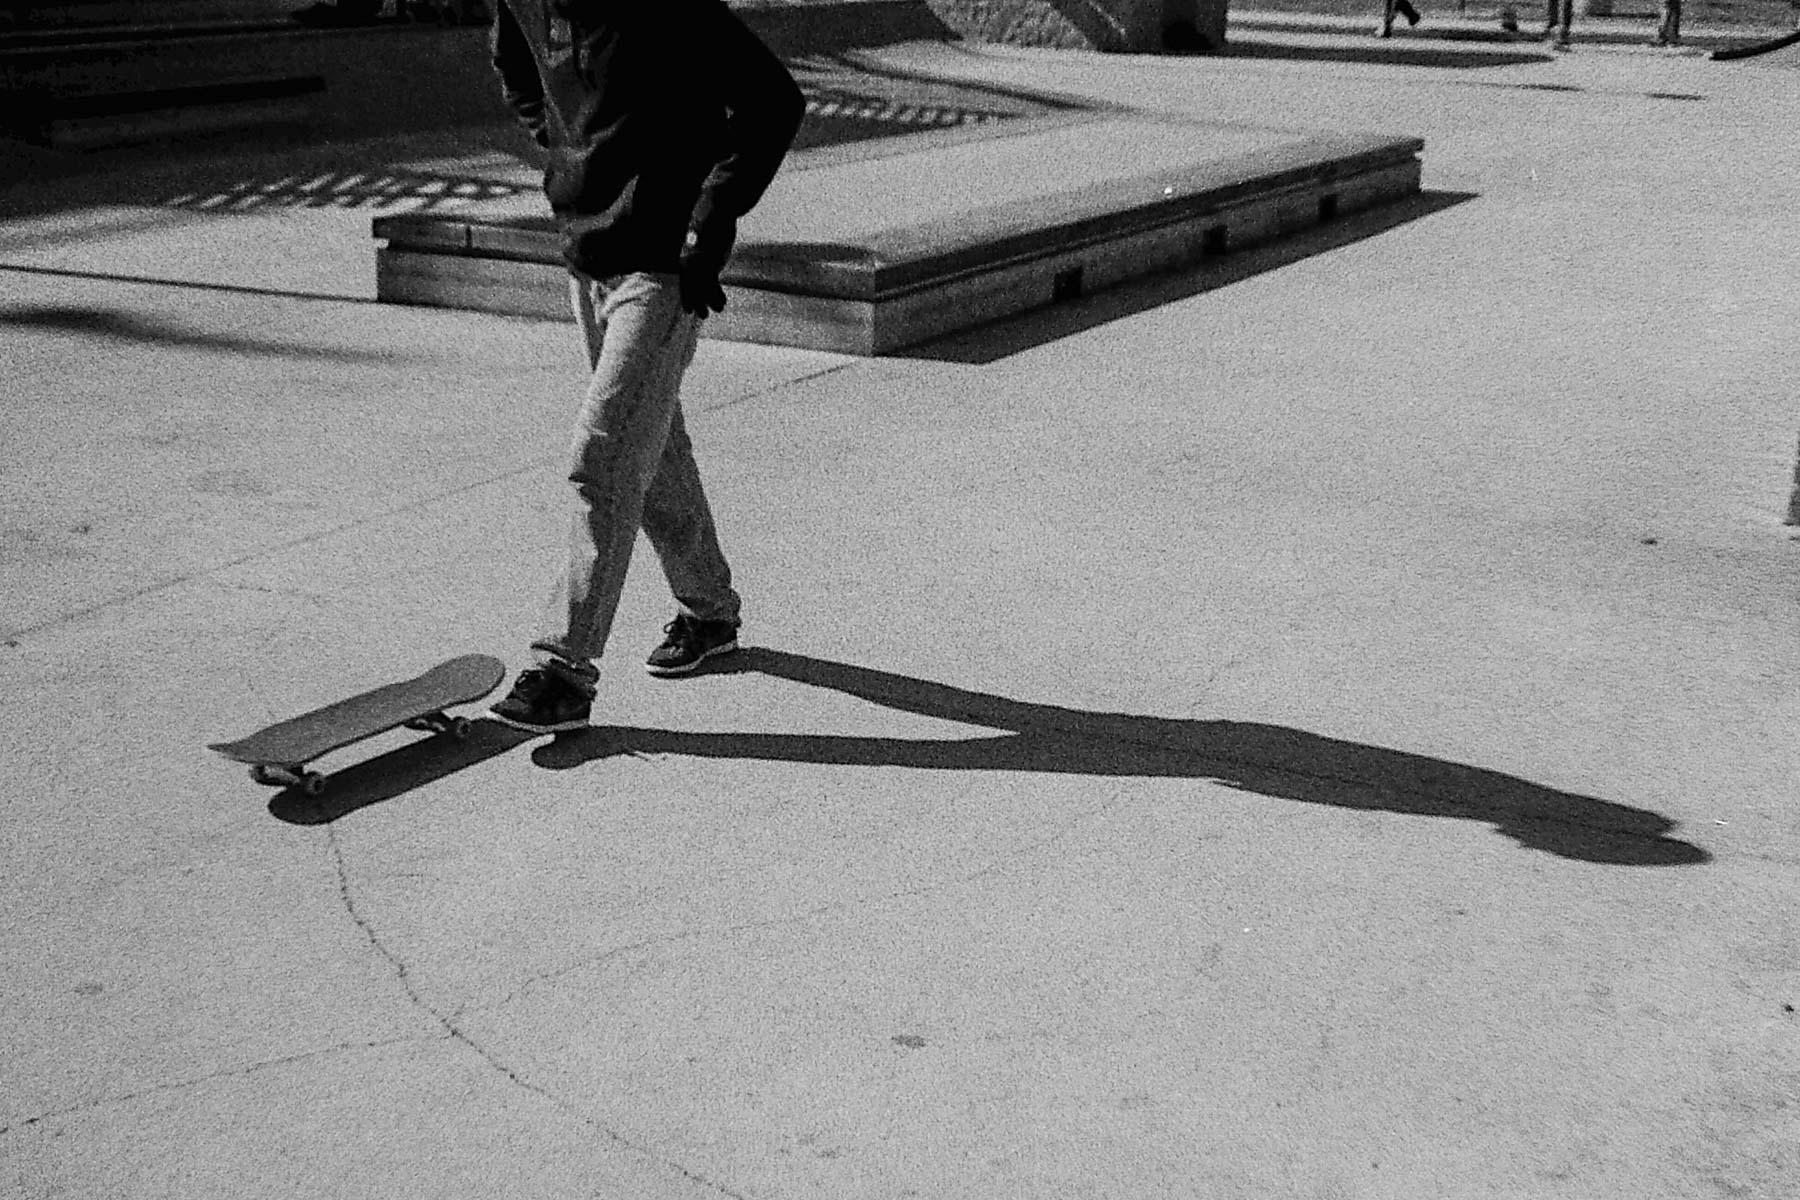 20130601_skate_001